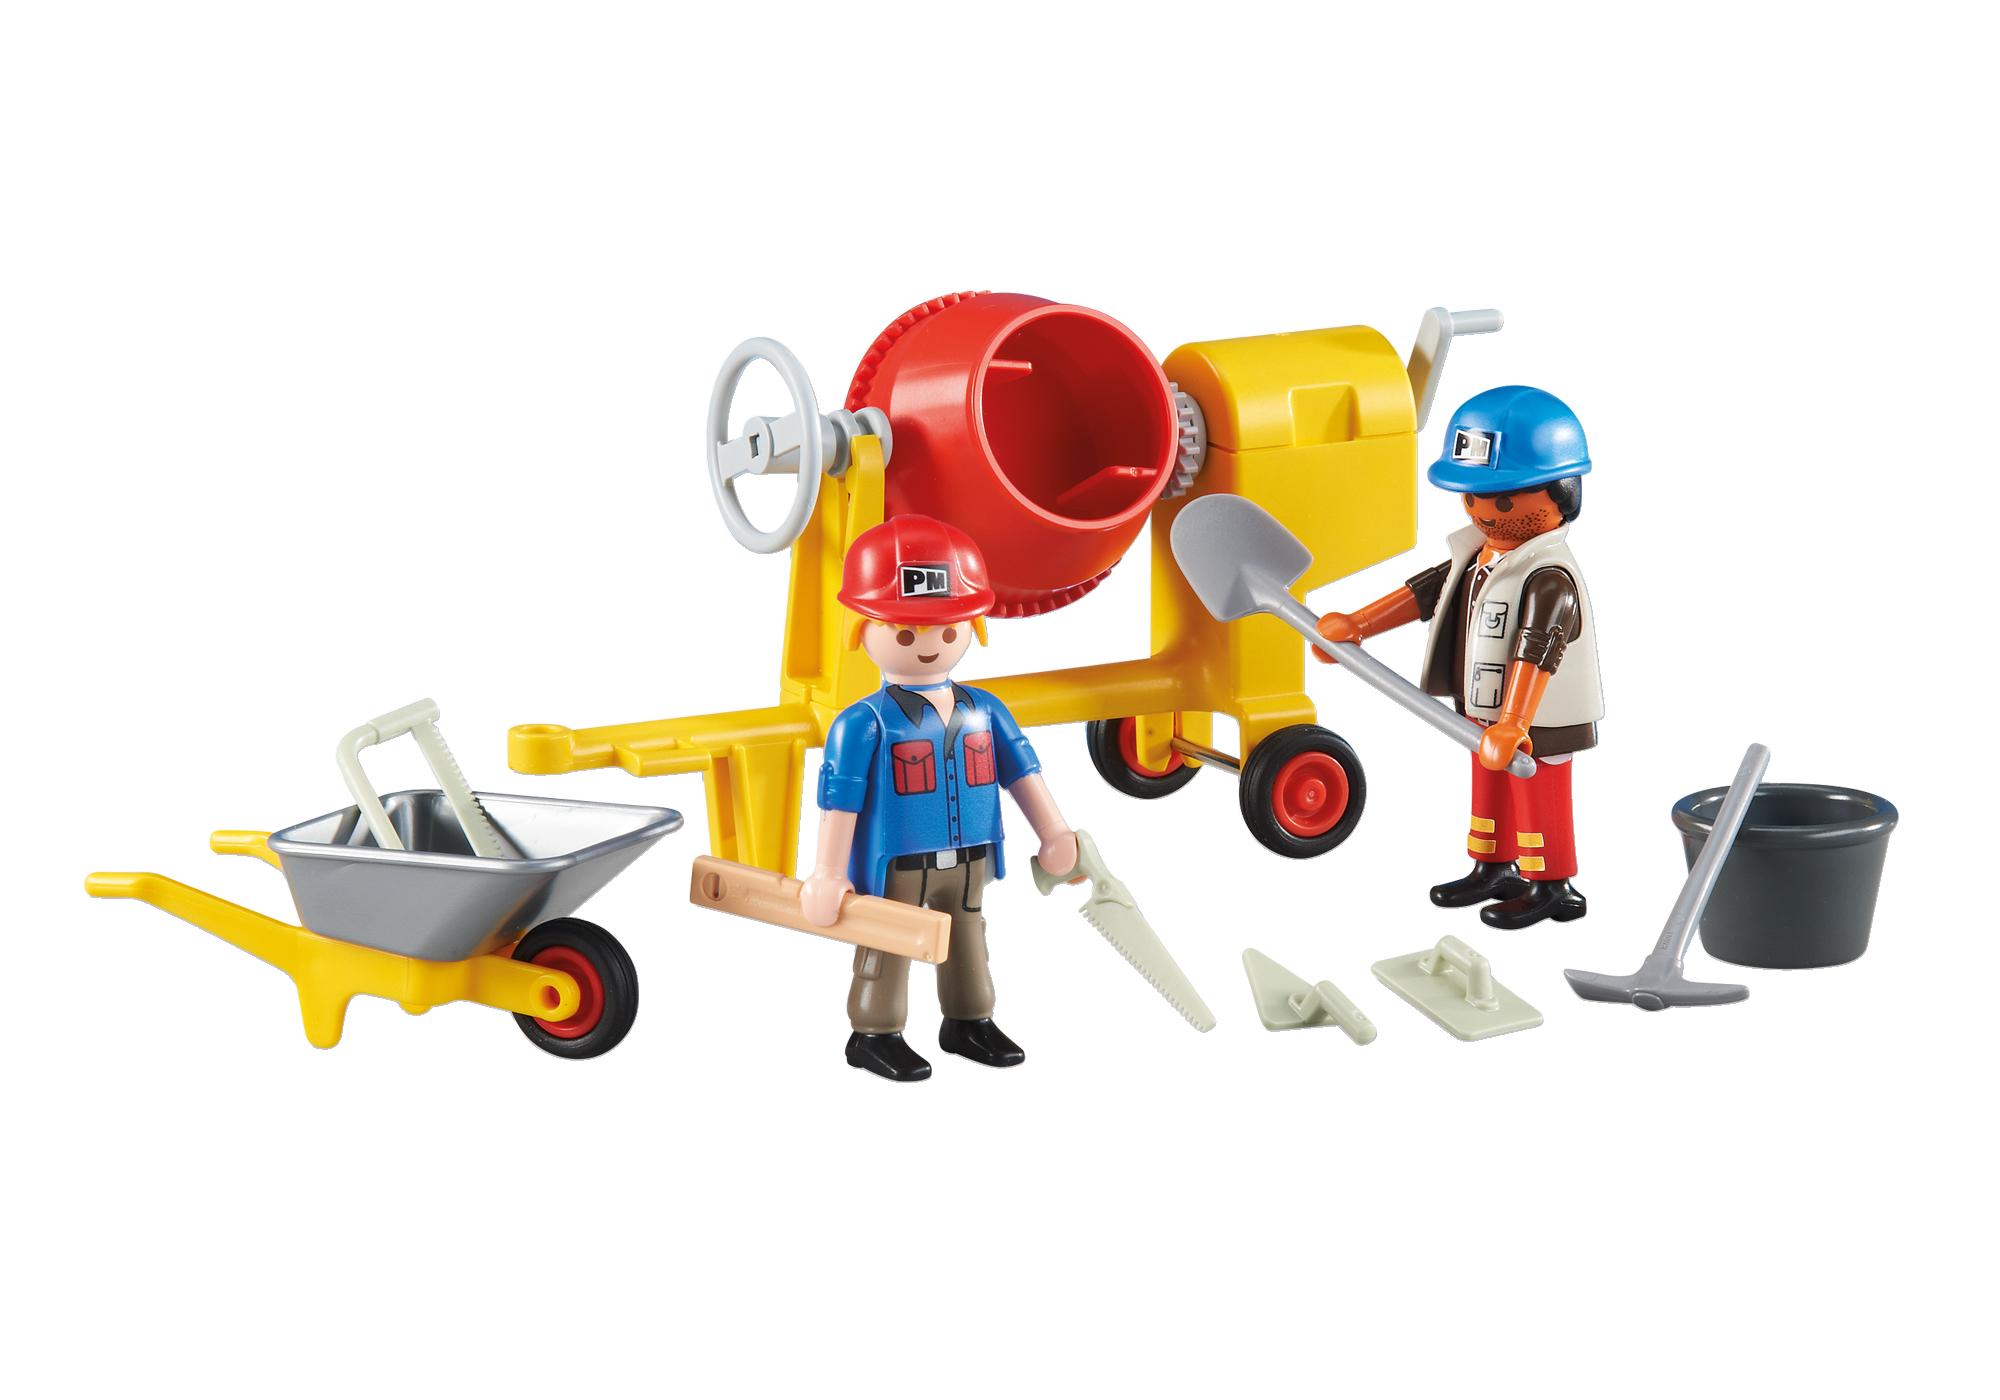 http://media.playmobil.com/i/playmobil/6339_product_detail/2 Obreros